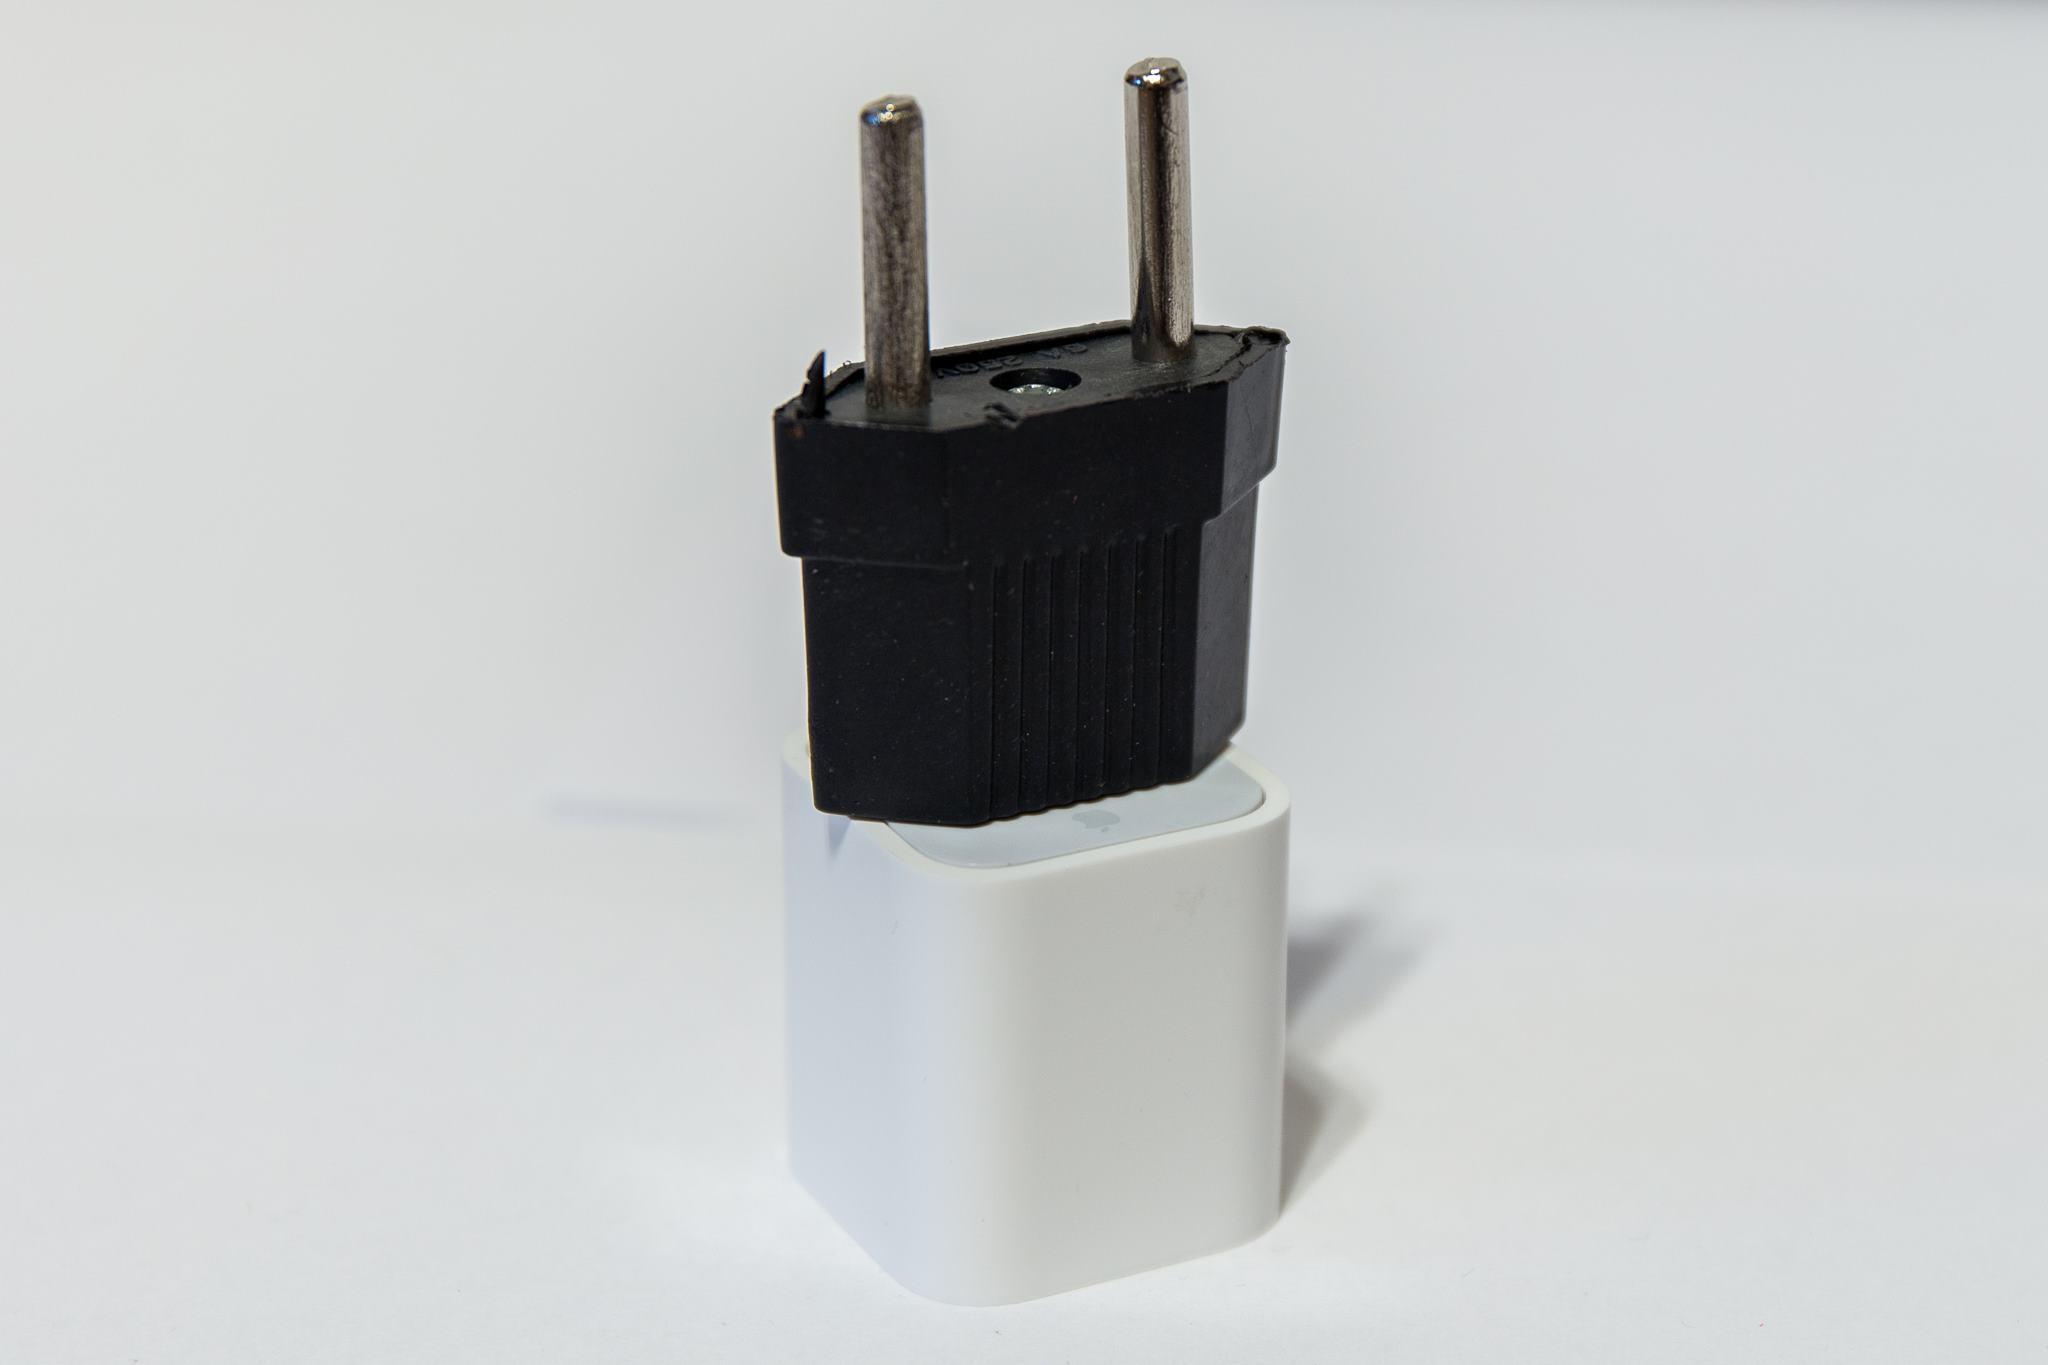 Oryginalna ładowarka / zasilacz Apple iPhone A1265